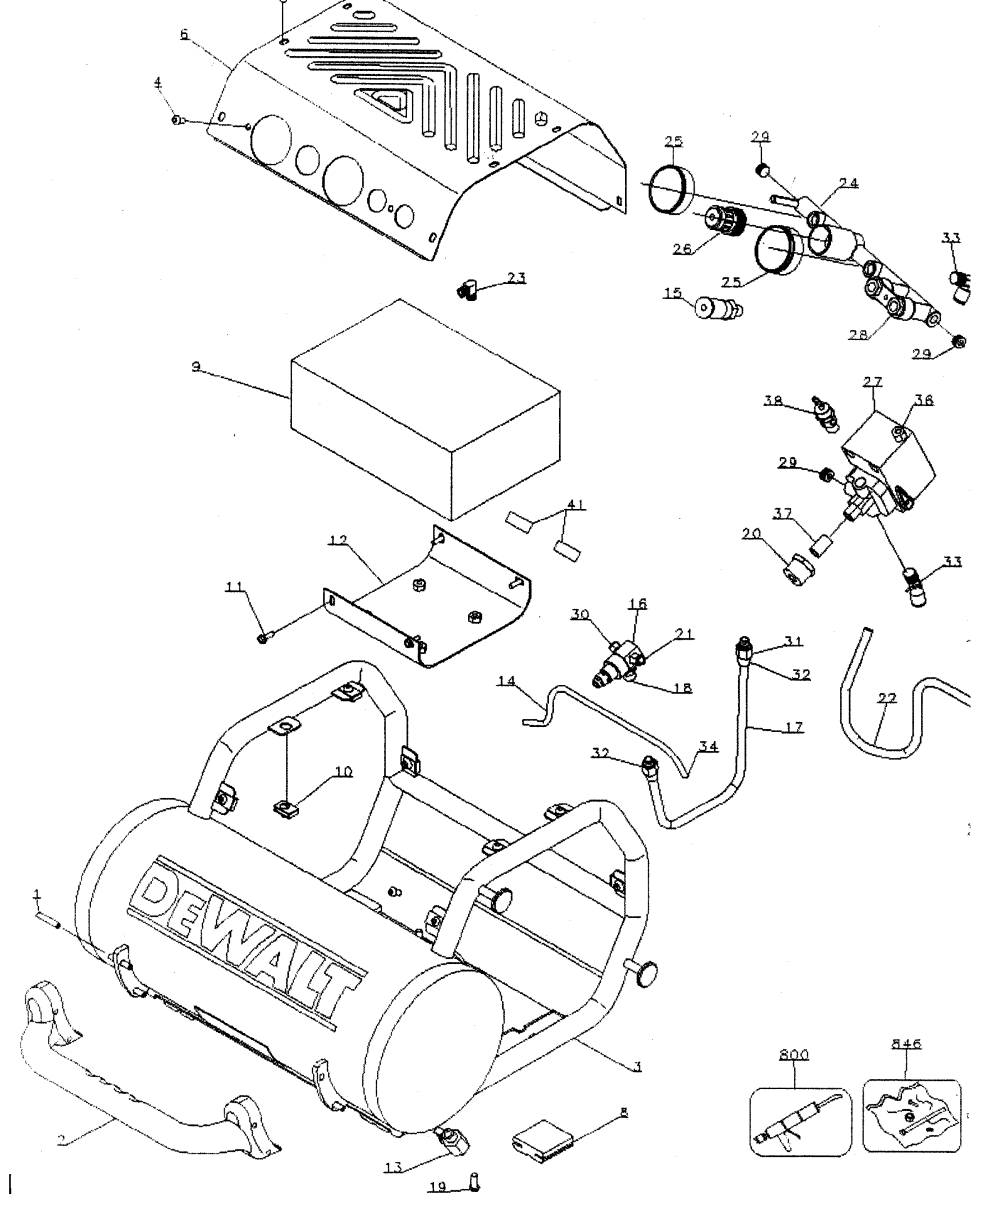 medium resolution of dewalt d55155 compressor diagram